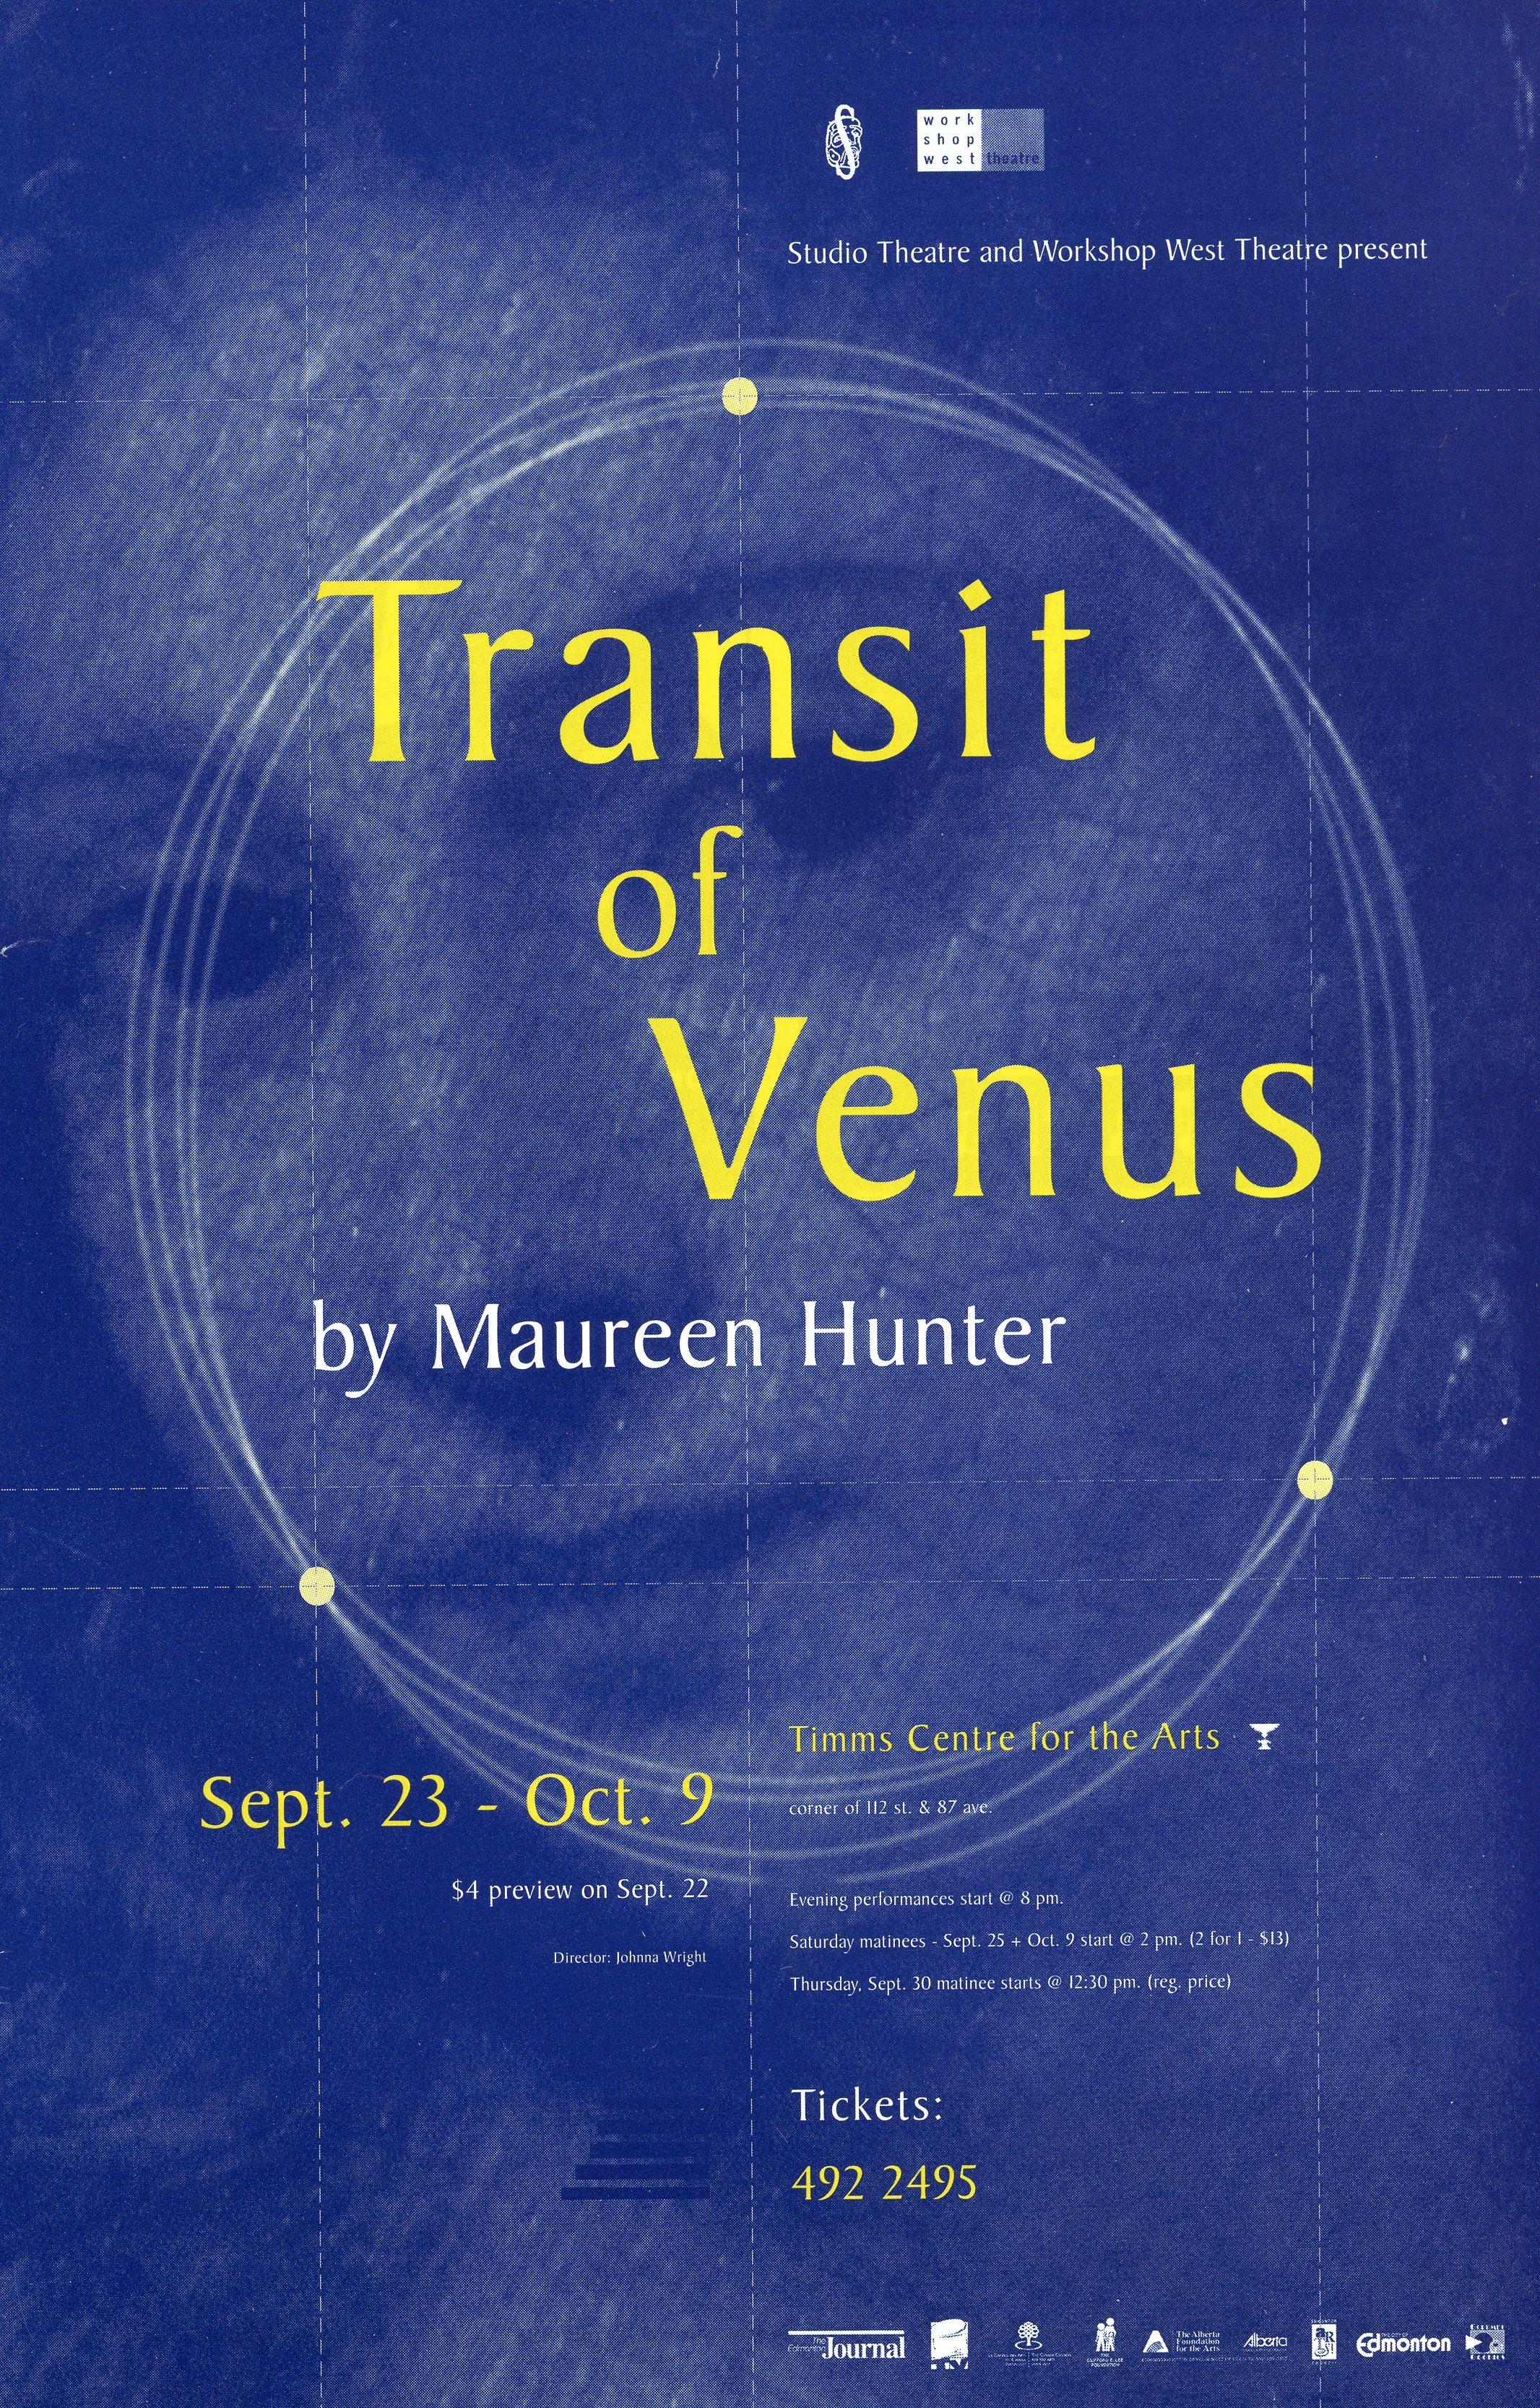 Transit of Venus (September,1999)-Production Cover_JPEG.jpg